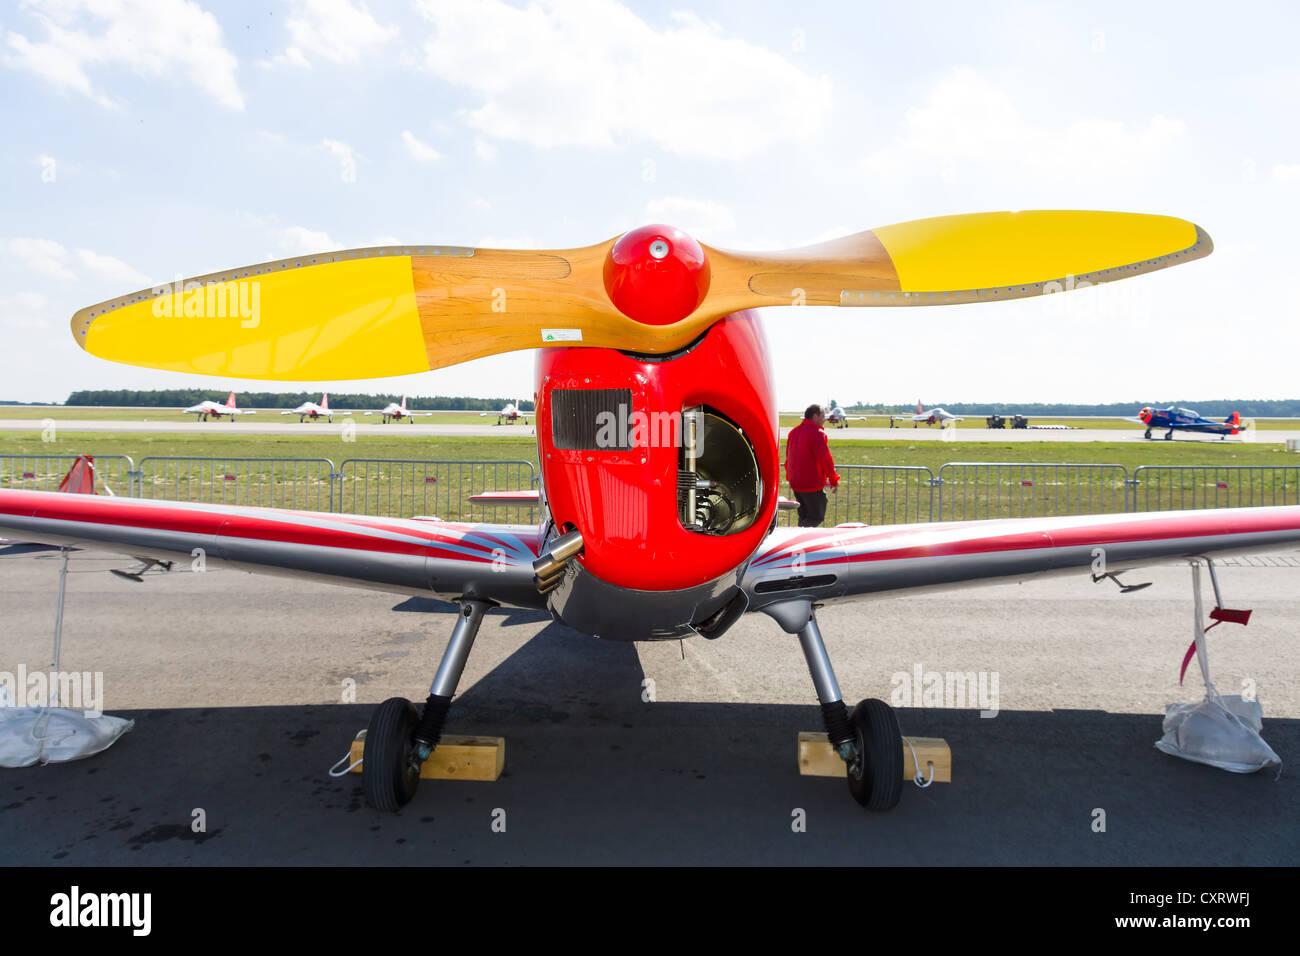 Training aircraft Zlin Z226 Trener - Stock Image